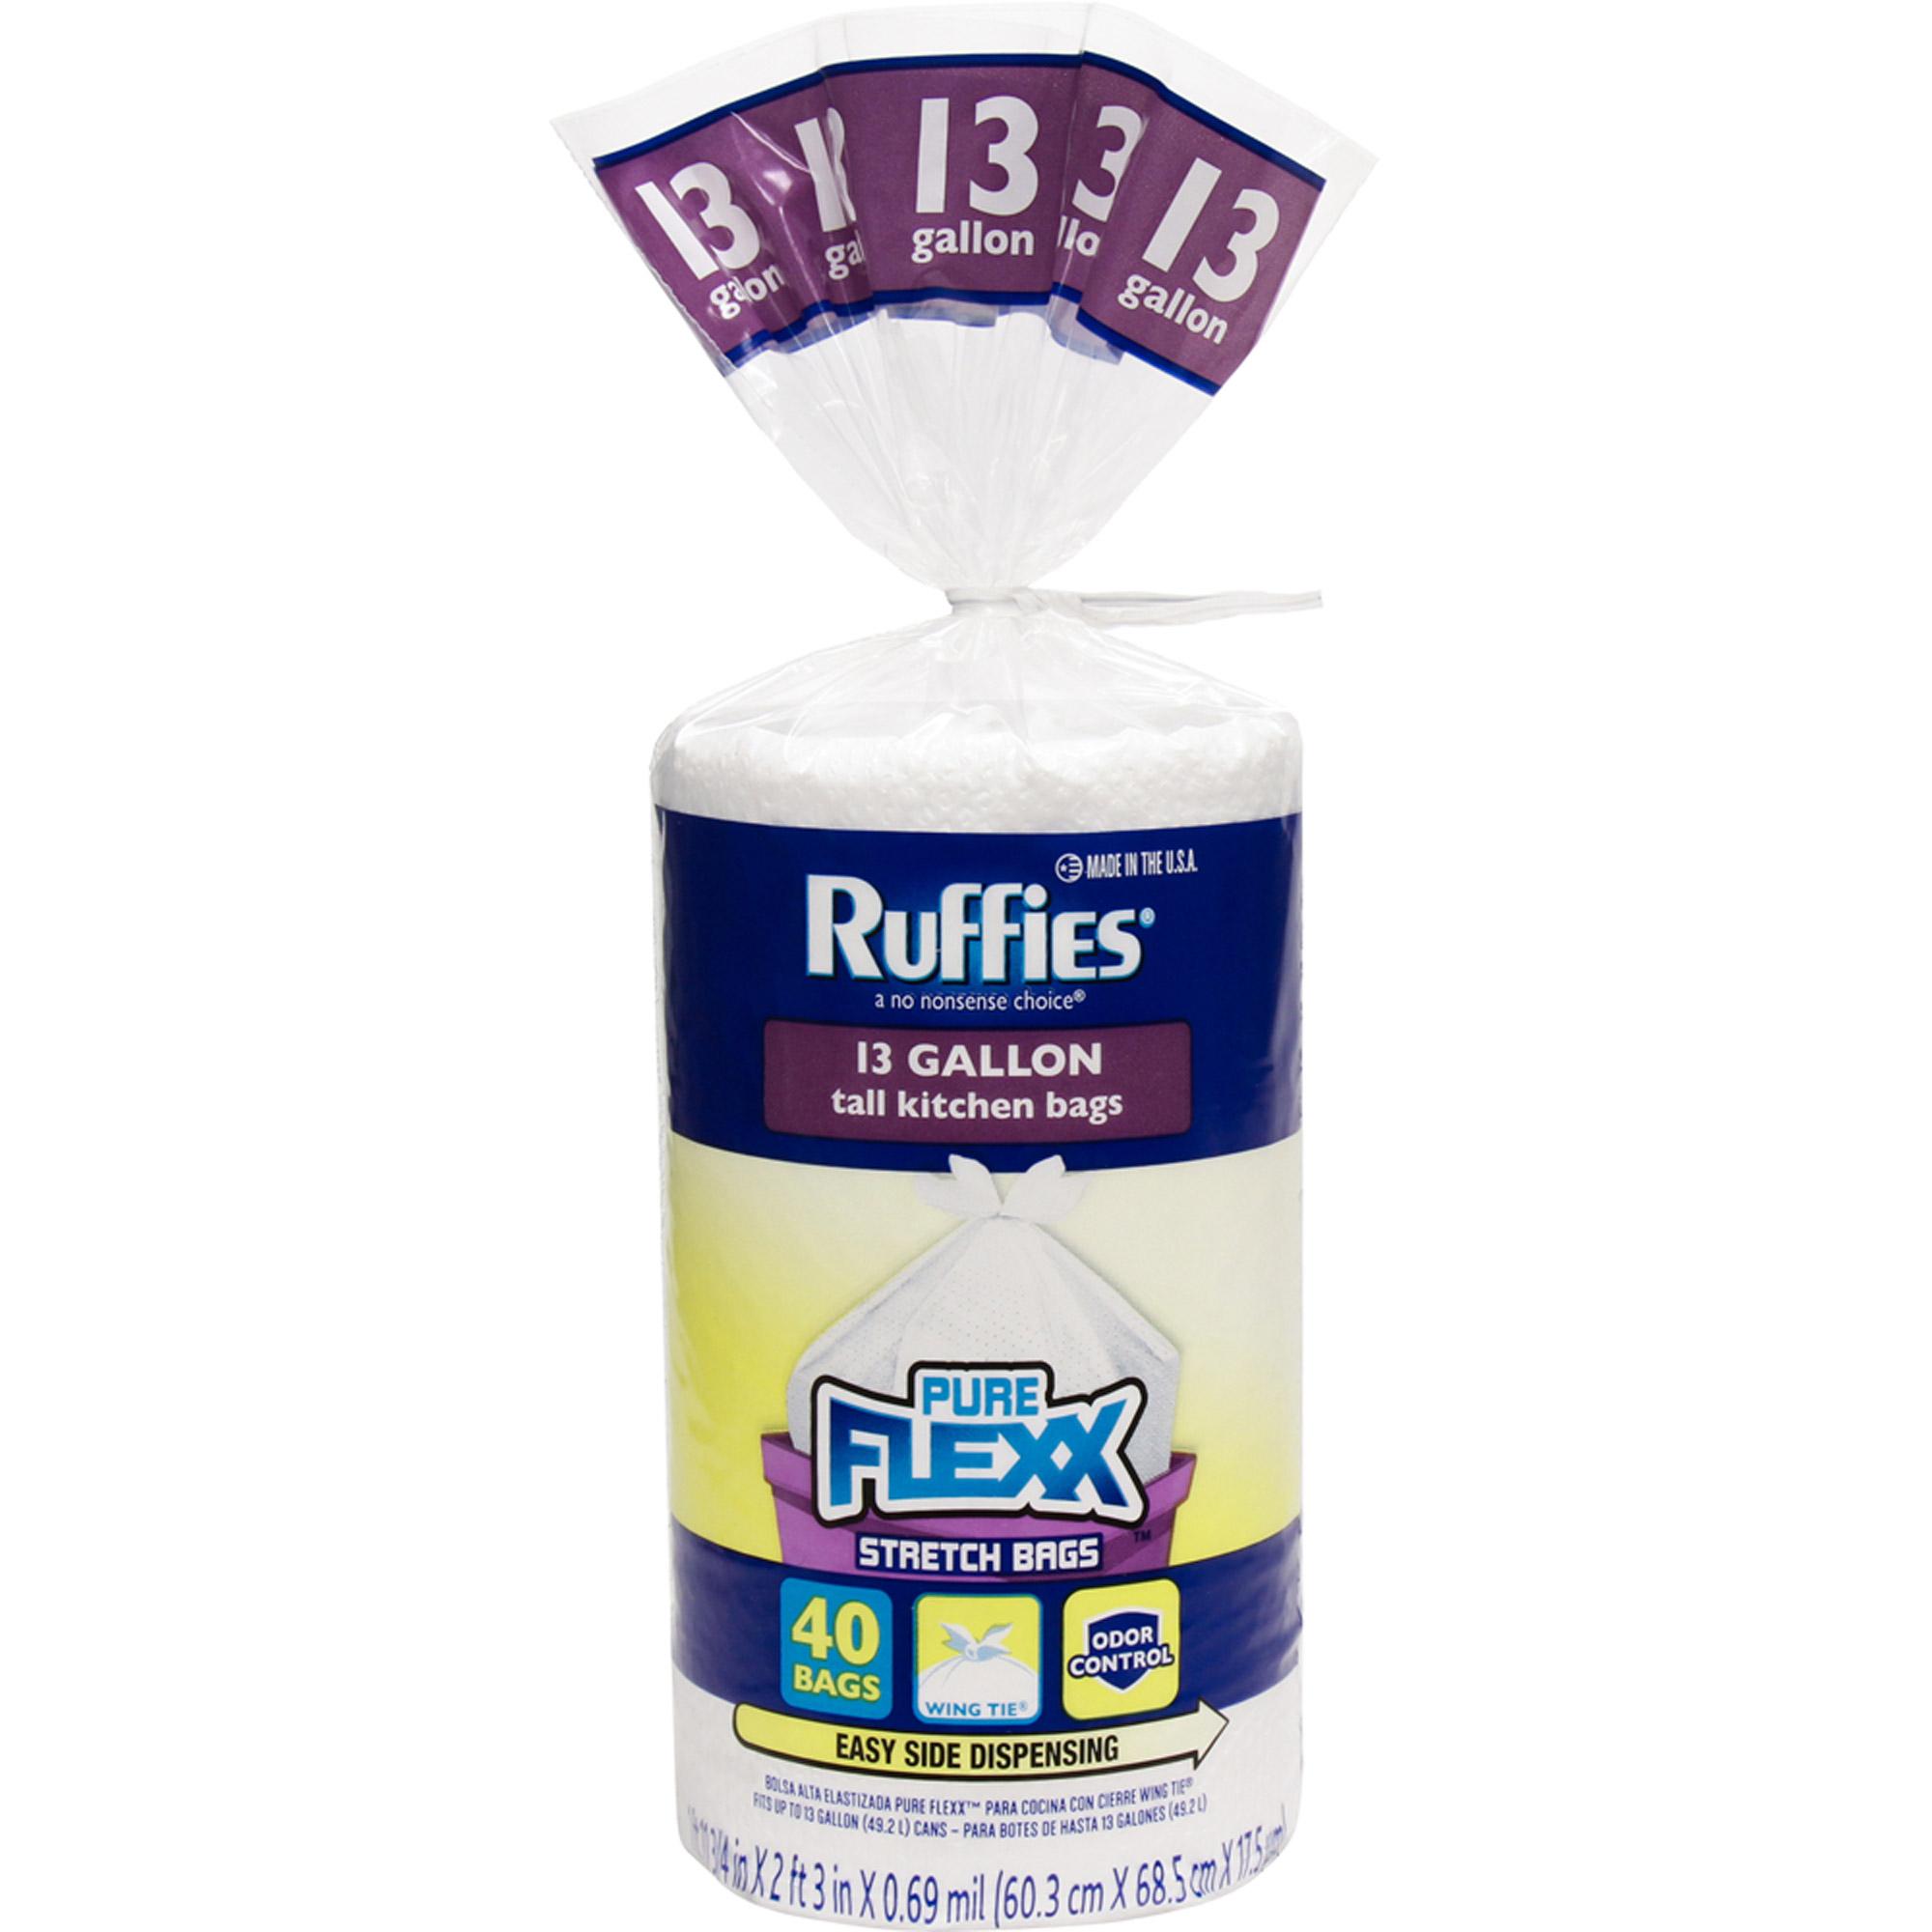 Ruffies Pure Flexx Tall Kitchen Stretch Trash Bags, 13 gal, 40 count